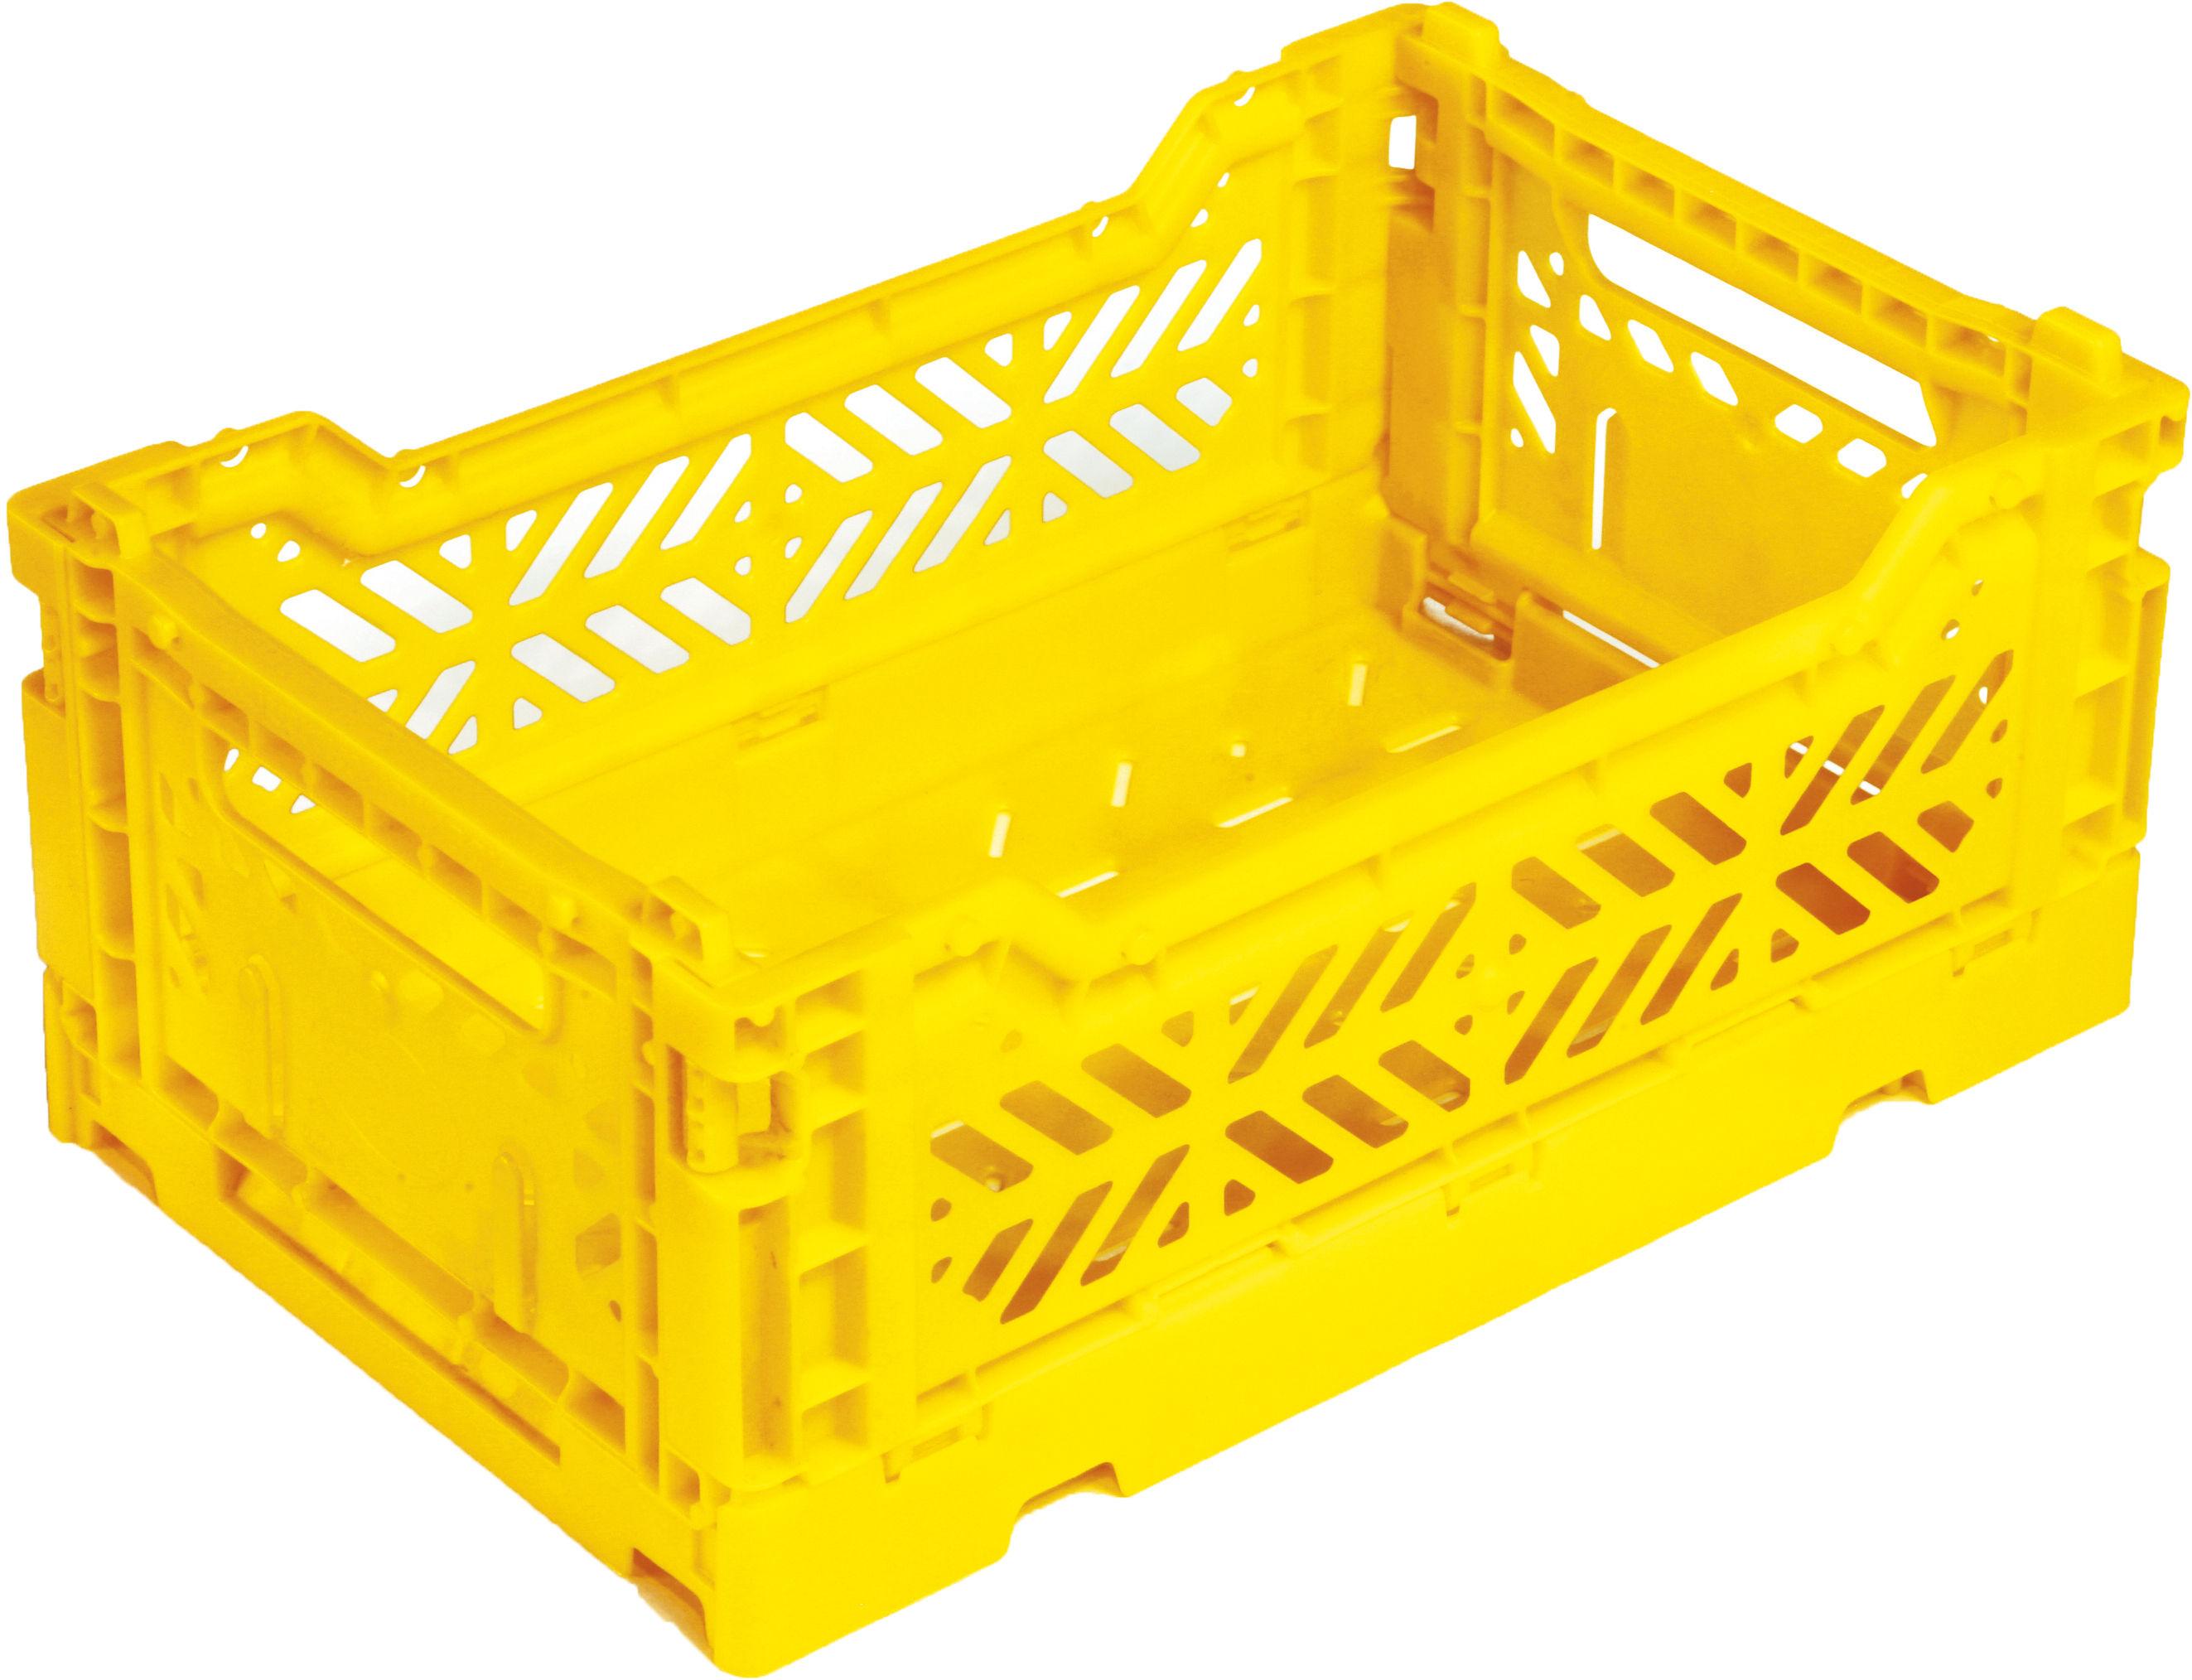 Accessories - Desk & Office Accessories - Mini Box Storage rack - Foldable L 26,5 cm by Surplus Systems - Pop Corn - Yellow - Polypropylene